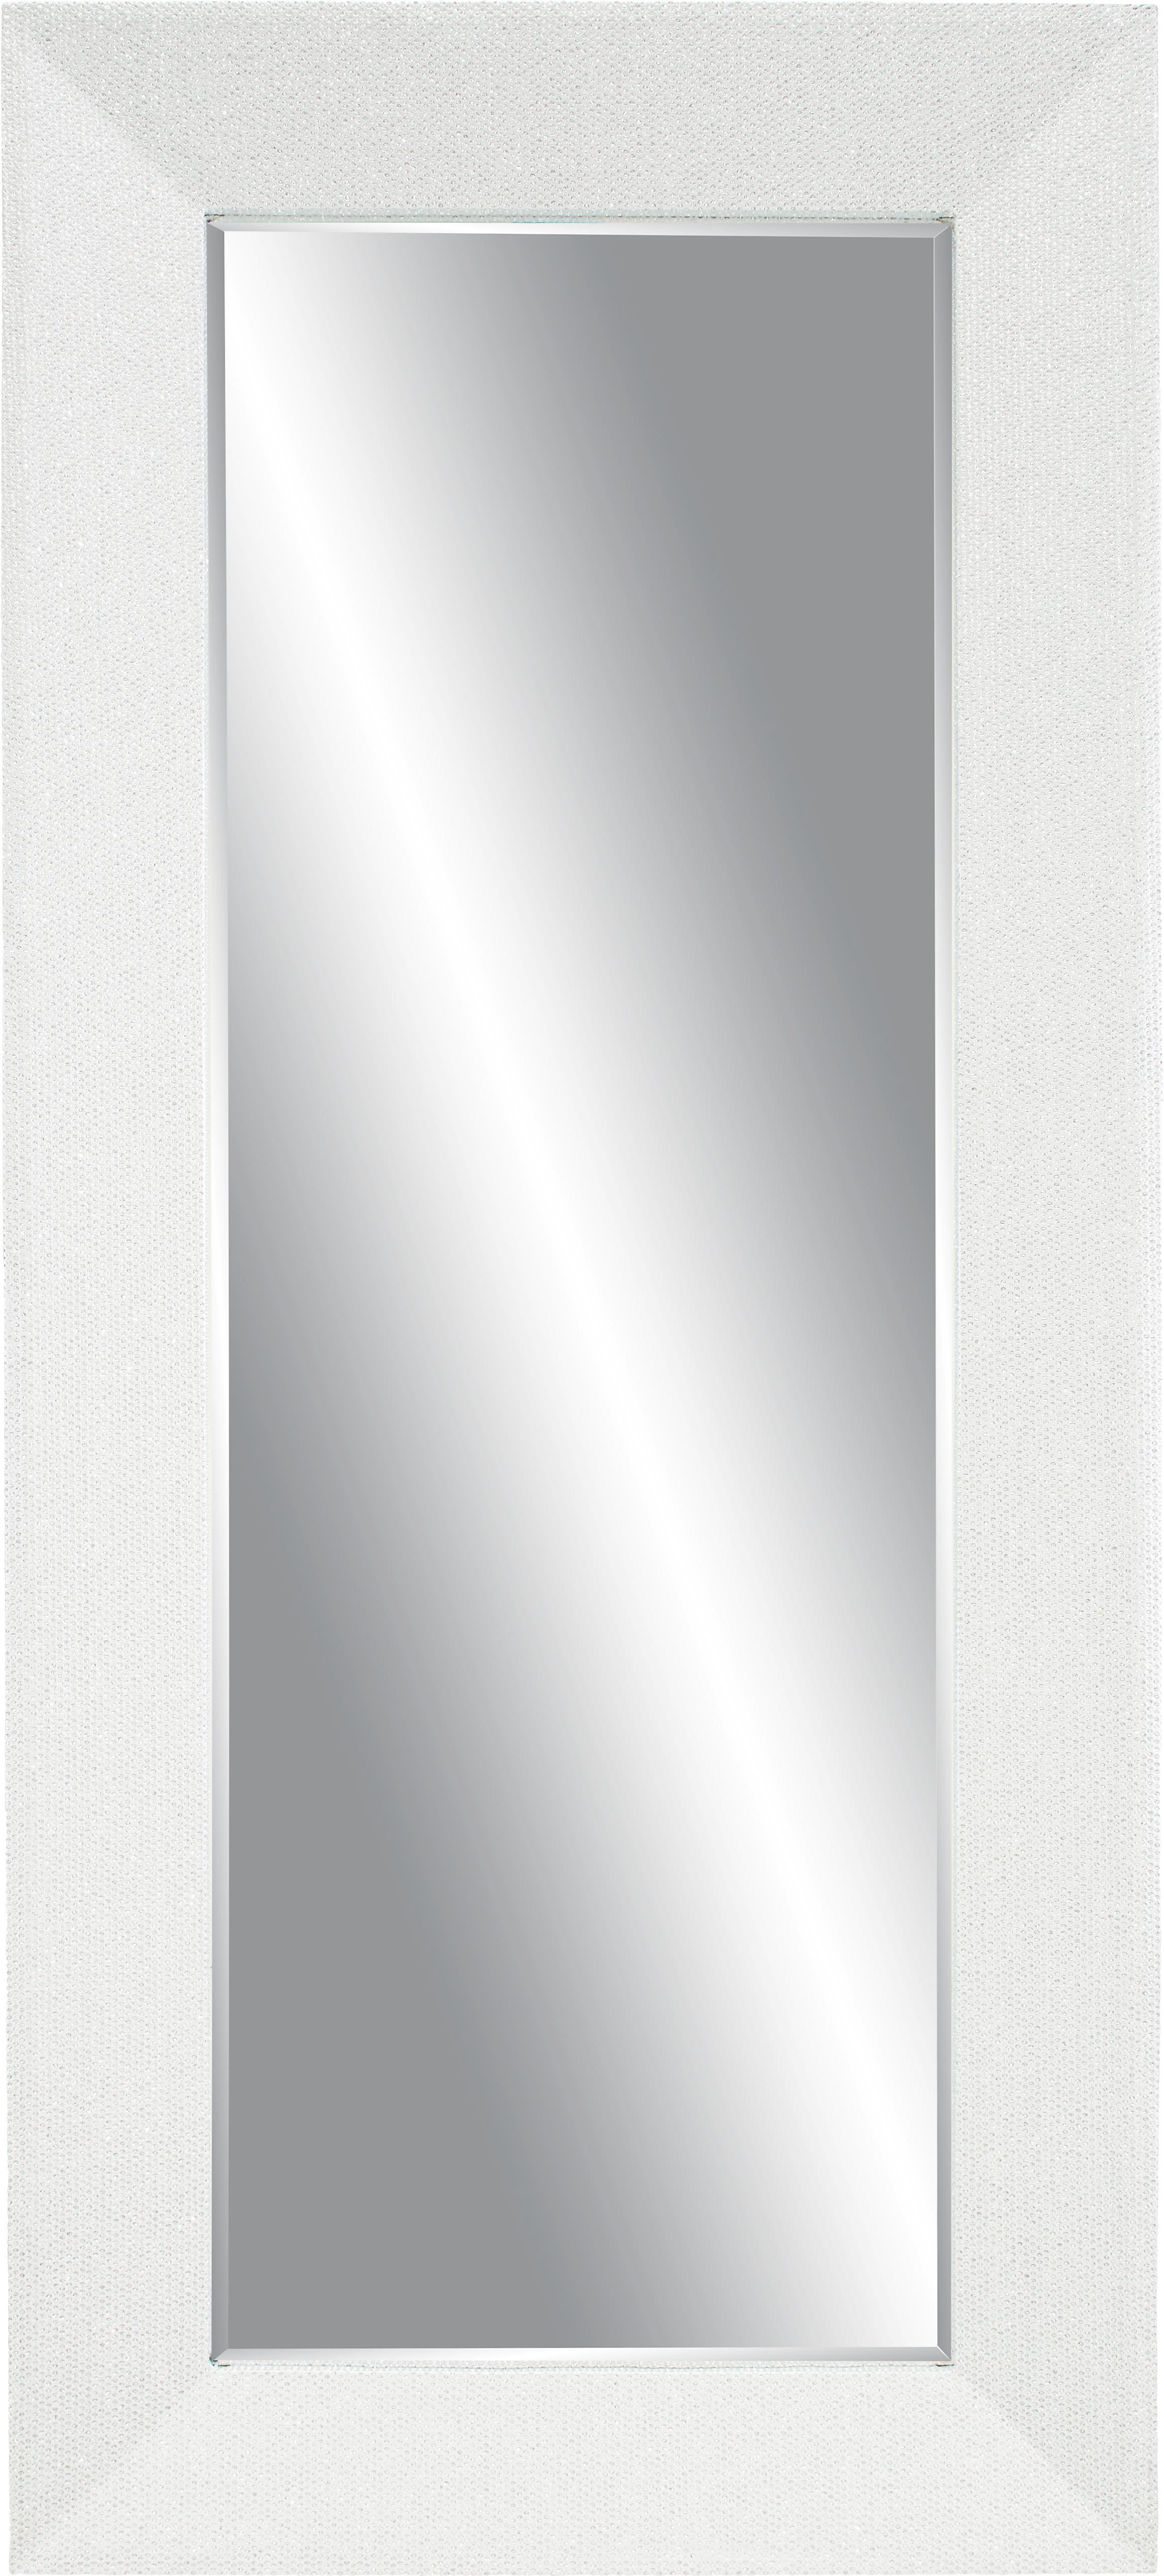 Wandspiegel 180 Cm. Elegant Wandspiegel Skinny Cm Gold Antik With ...